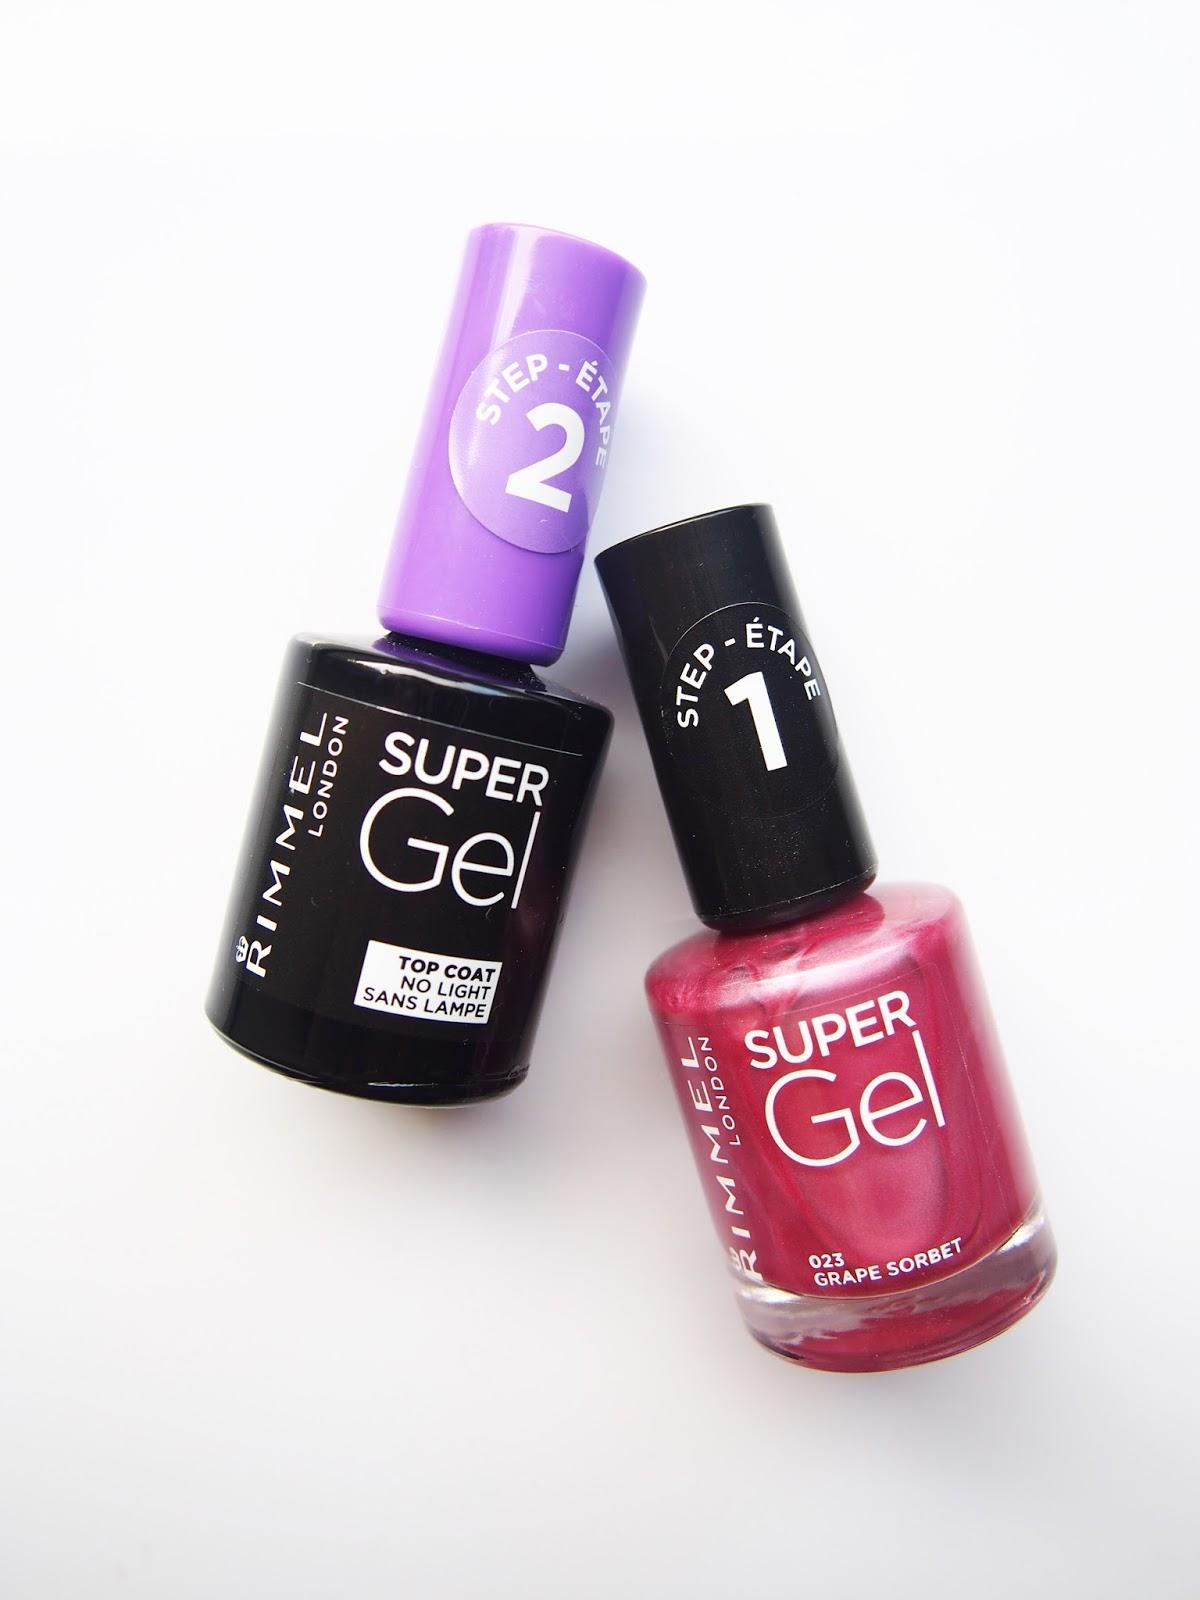 Review: Rimmel Super Gel Duo Set 023 Grape Sorbet